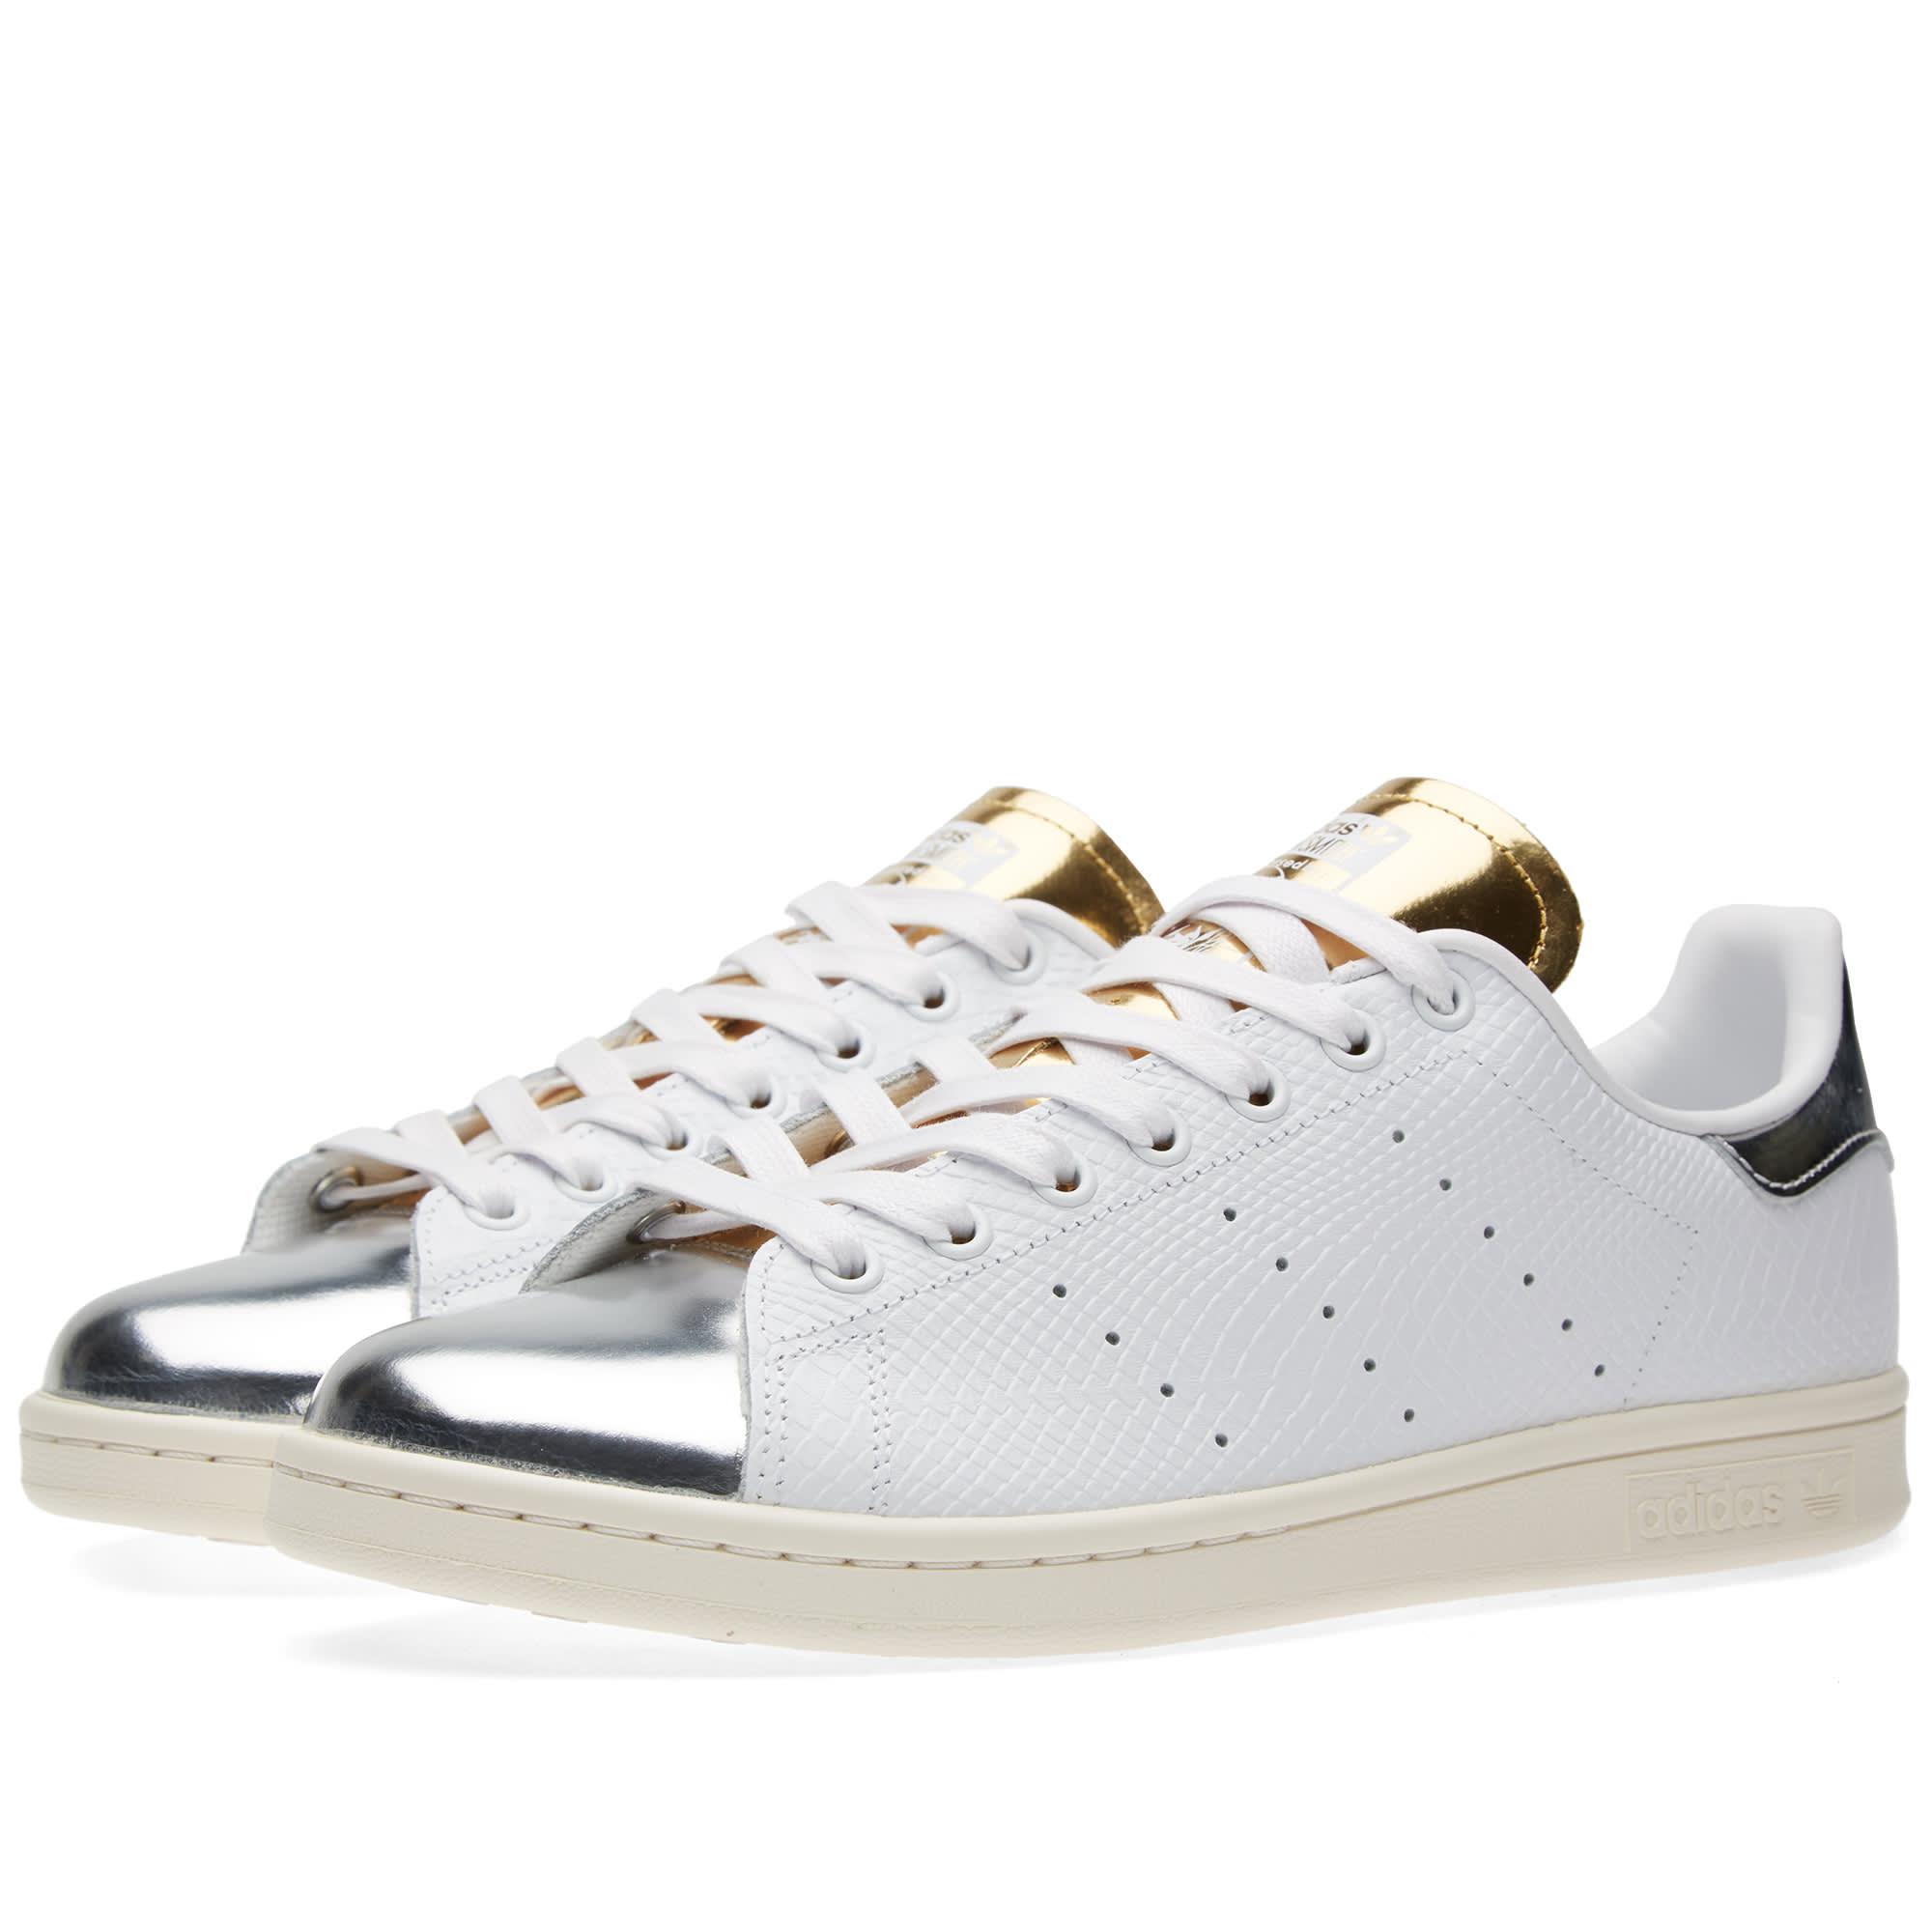 adidas stan smith white silver metallic. Black Bedroom Furniture Sets. Home Design Ideas